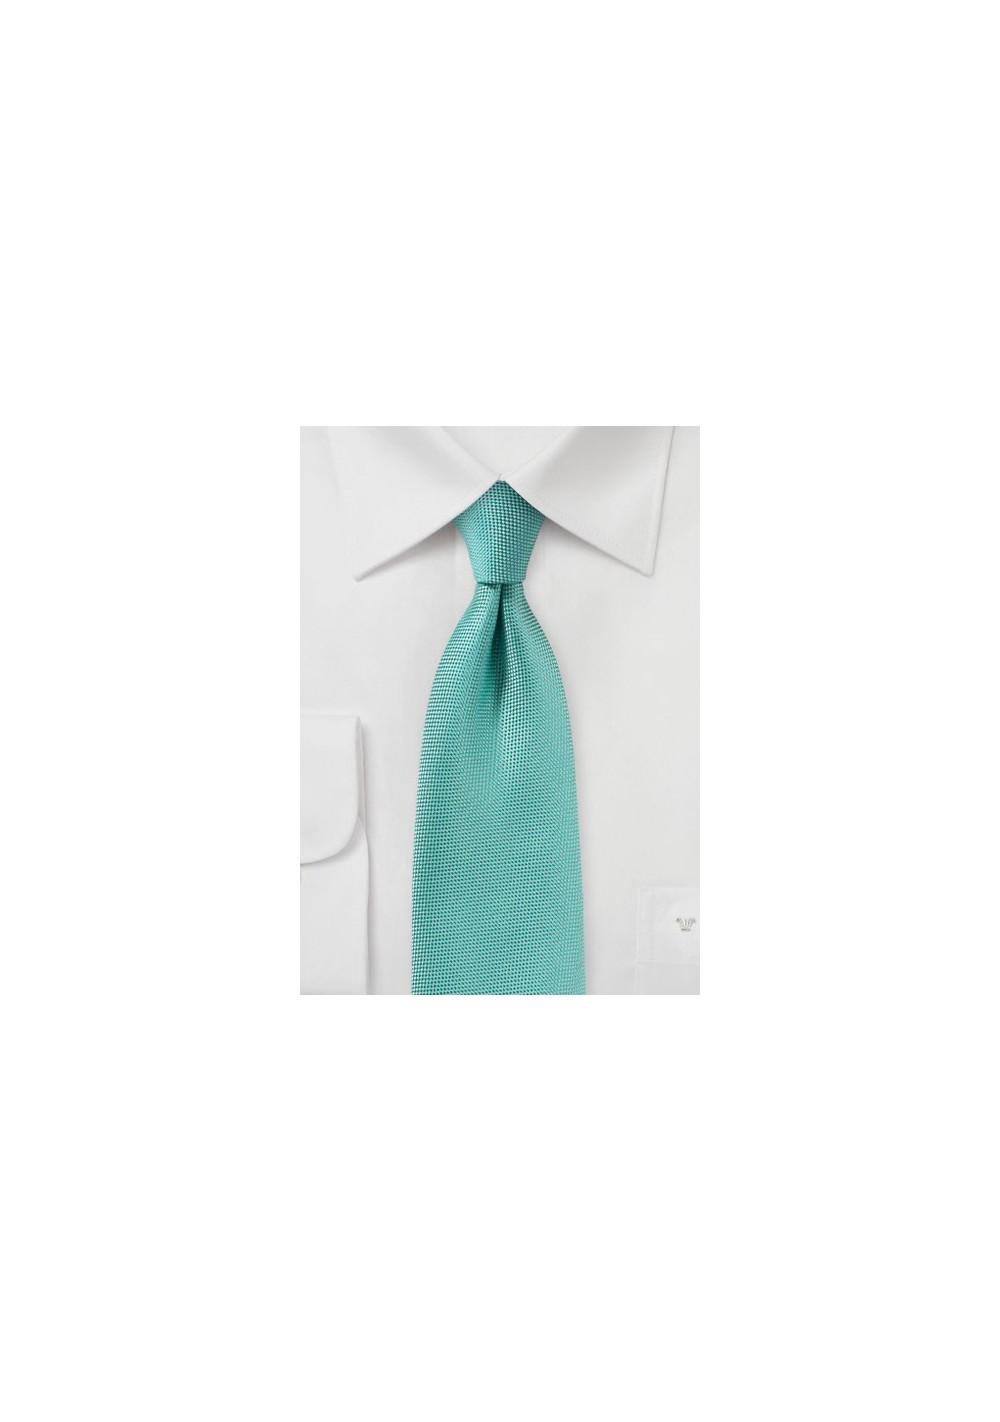 Mermaid Blue Matte Finish Tie